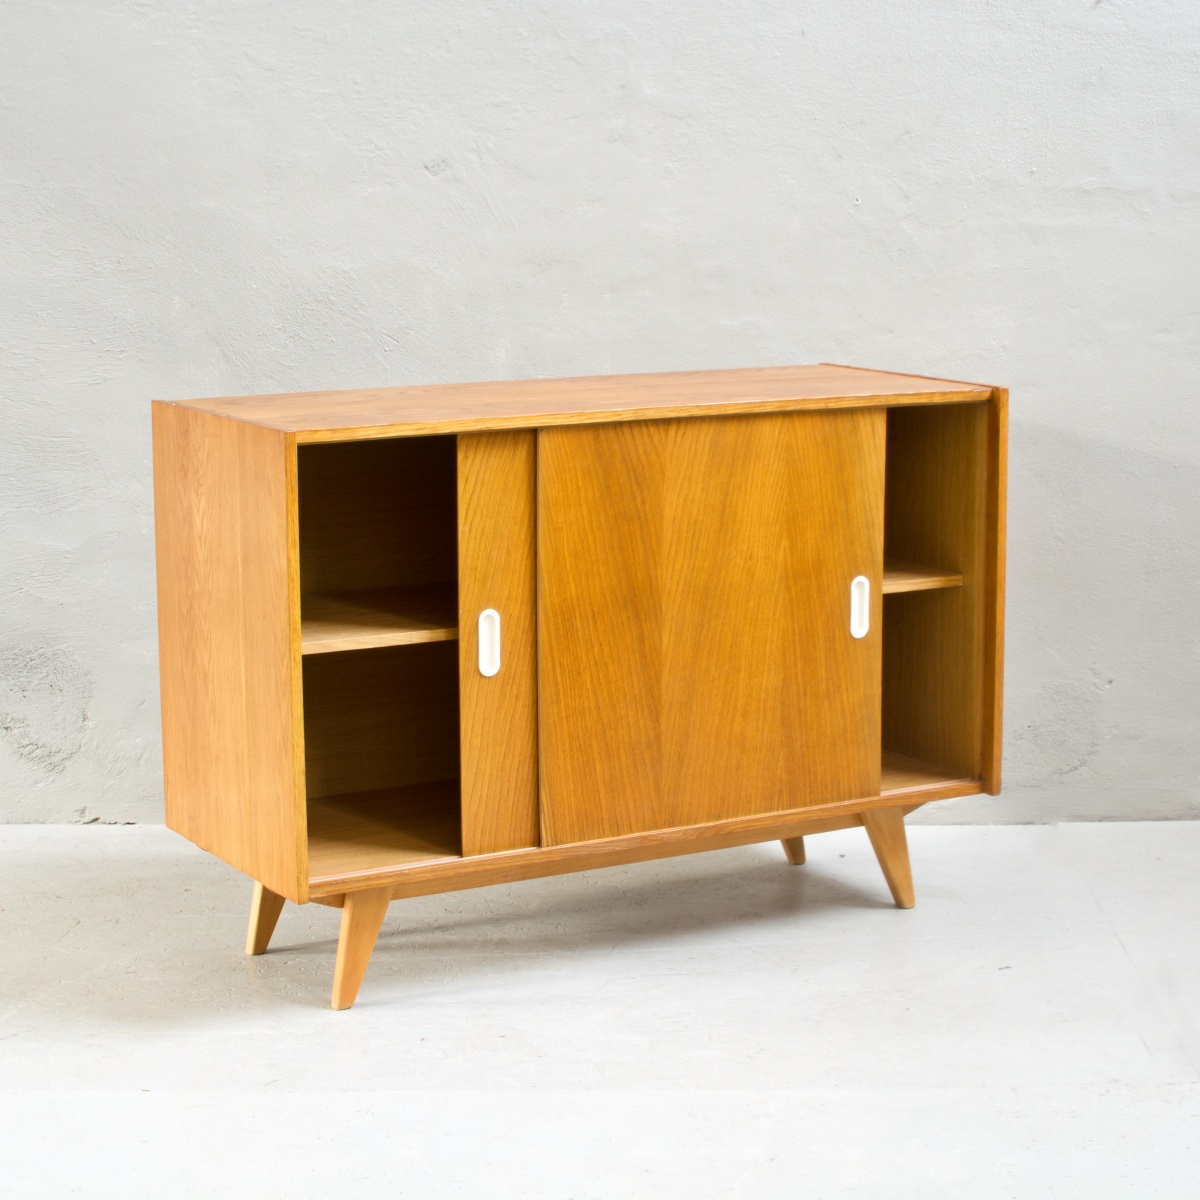 Prodej retro nábytku Jiroutek komoda